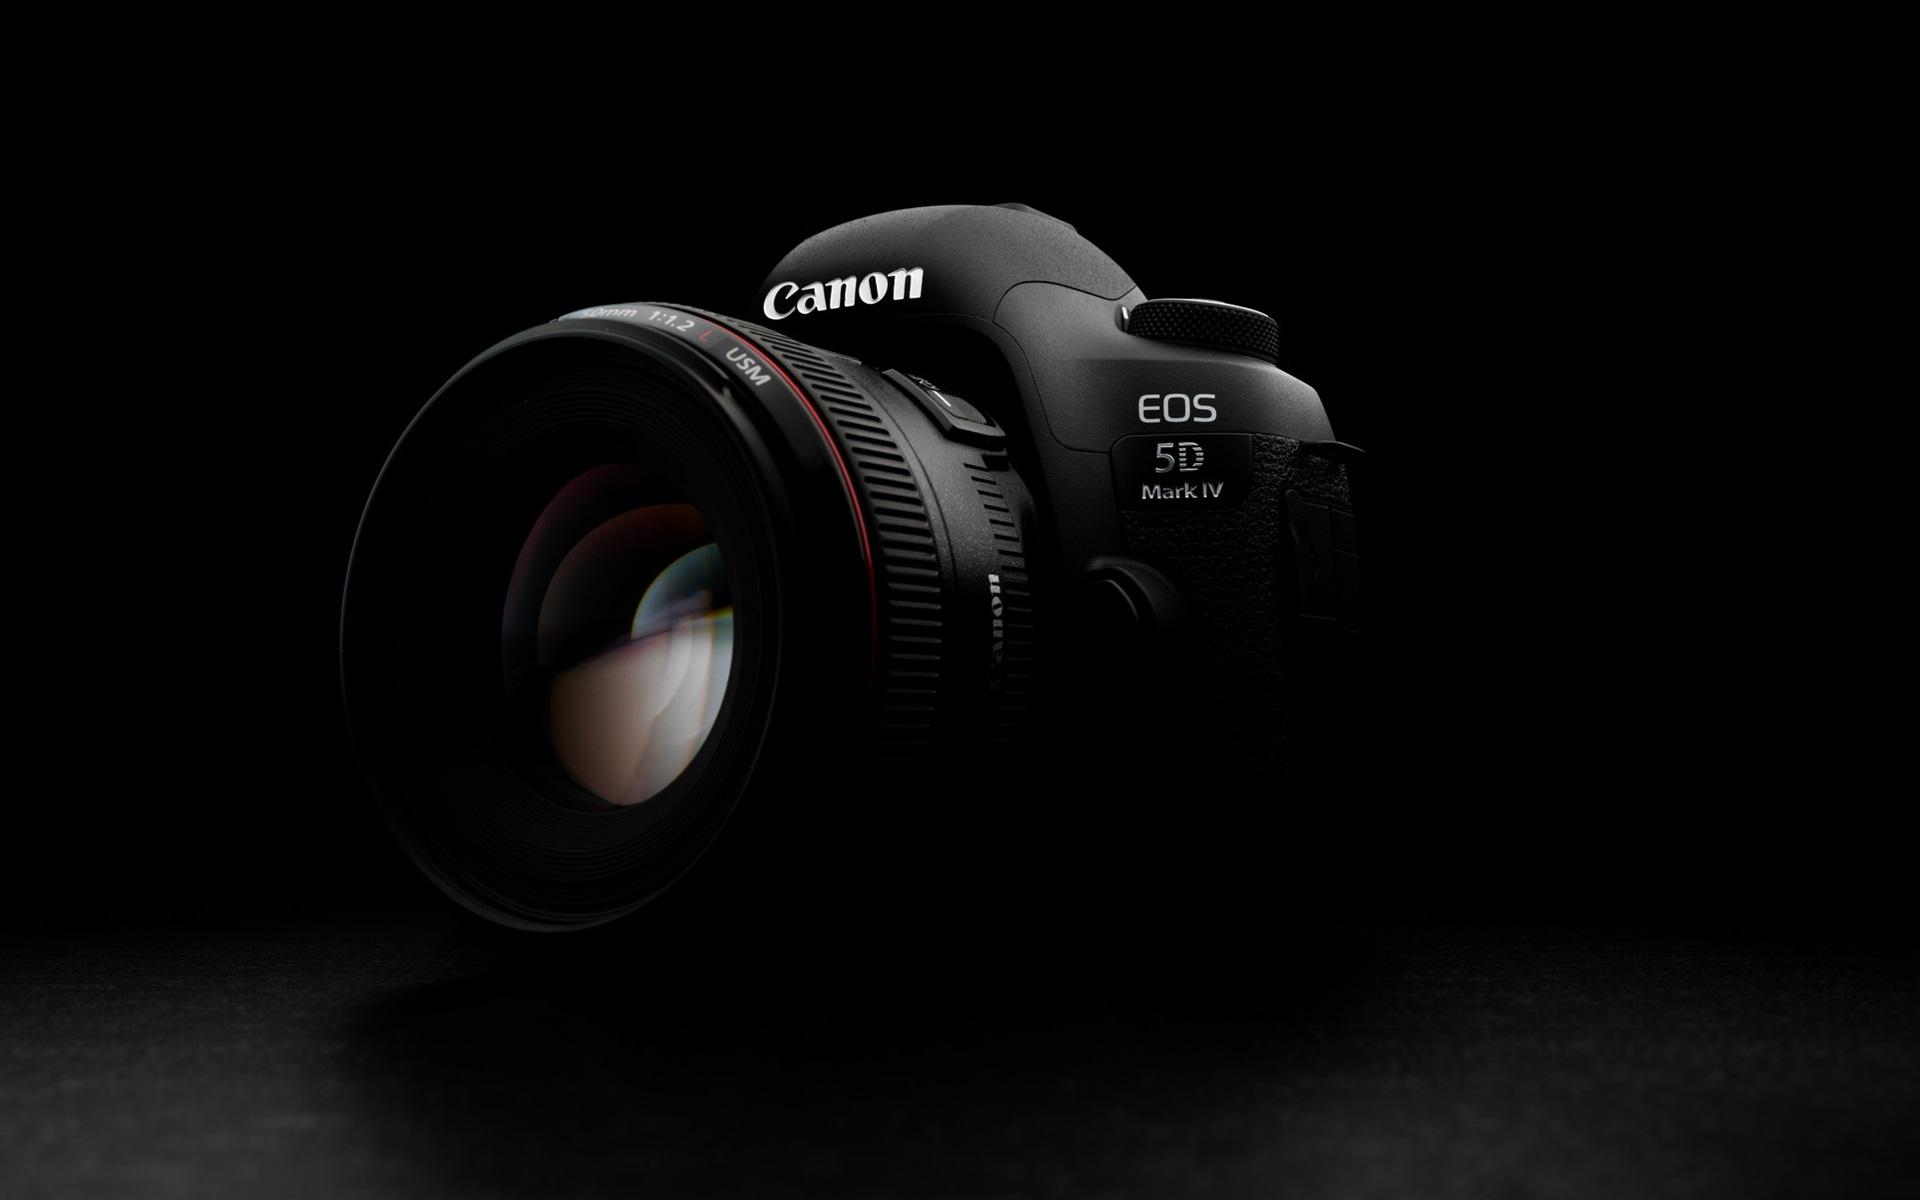 Wallpaper Canon EOS 5D Mark IV Digital Camera 1920x1200 HD Picture